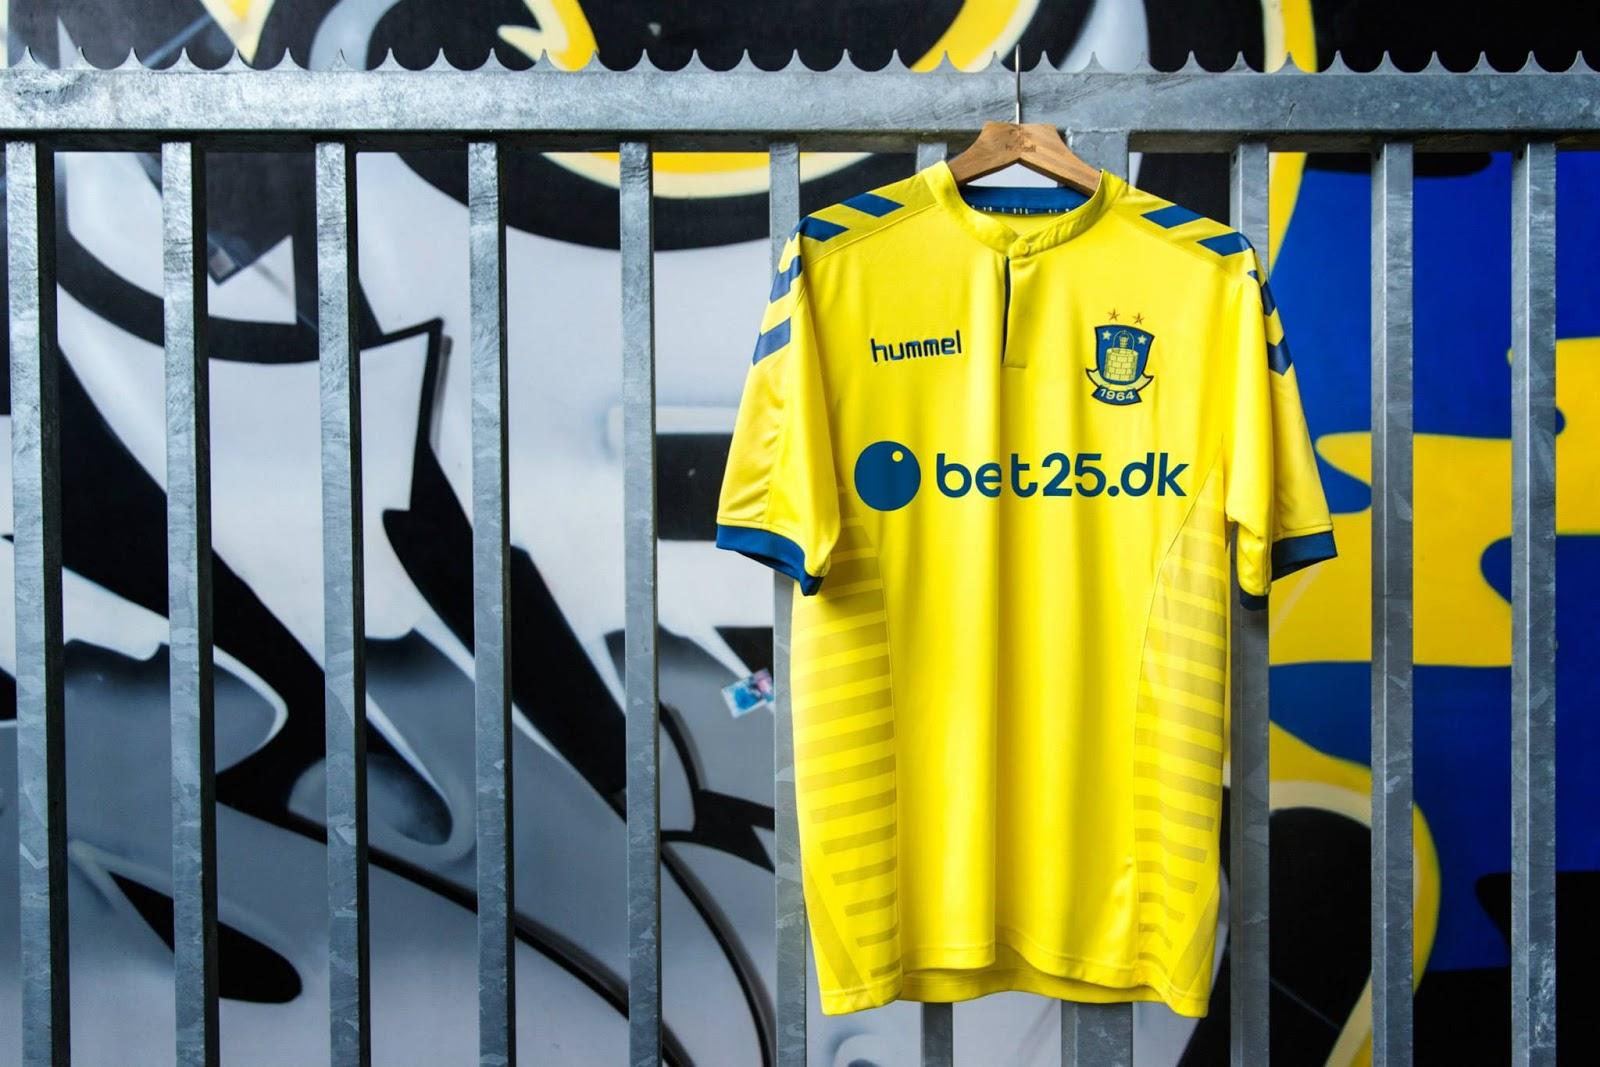 Brøndby 15-16 Home Kit Revealed - Footy Headlines